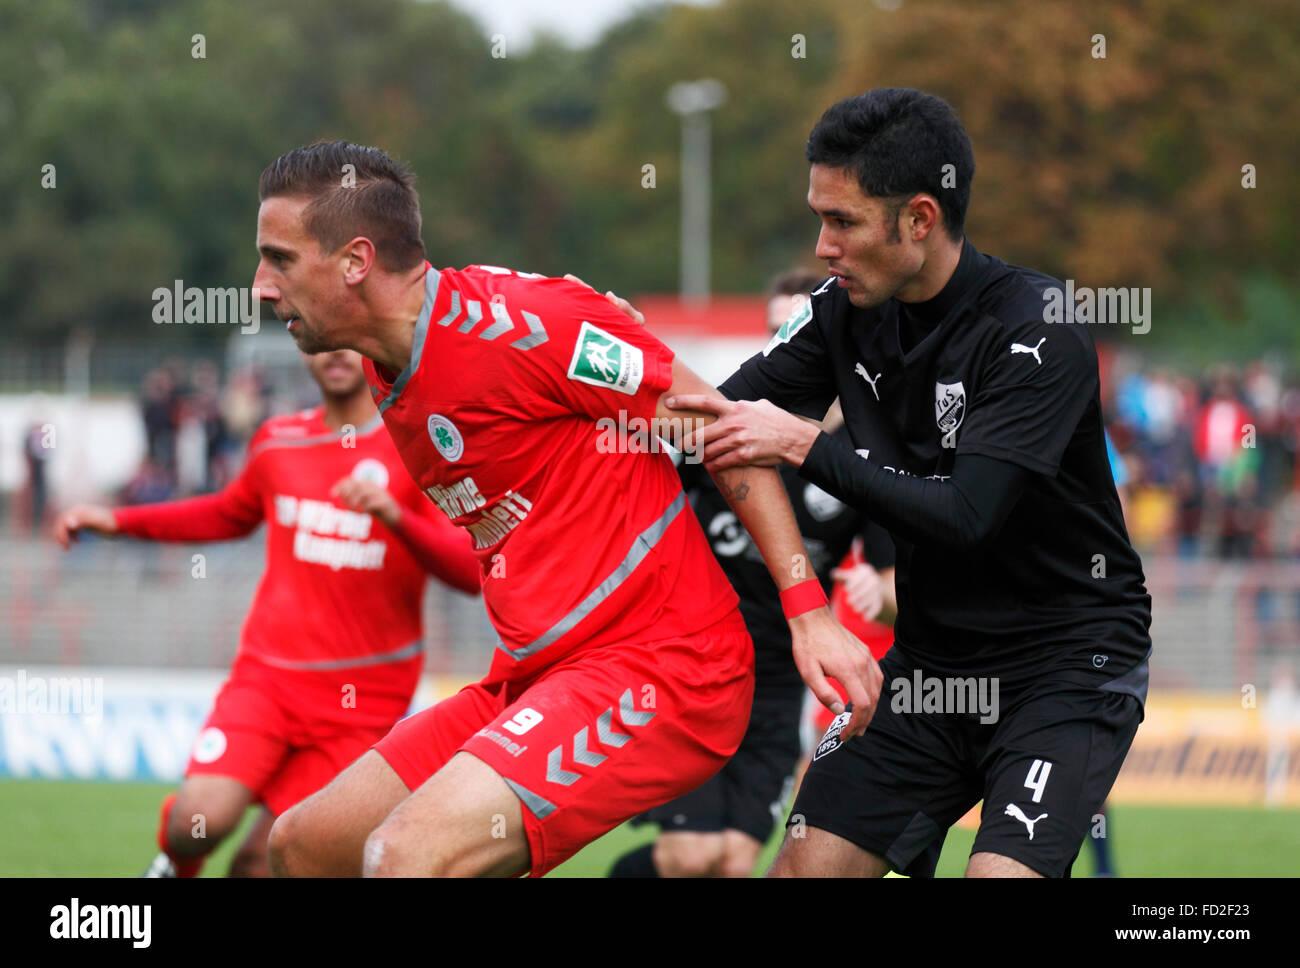 sports, football, Regional League West, 2015/2016, Rot Weiss Oberhausen versus TuS 1895 Erndtebrueck 3:1, Stadium - Stock Image